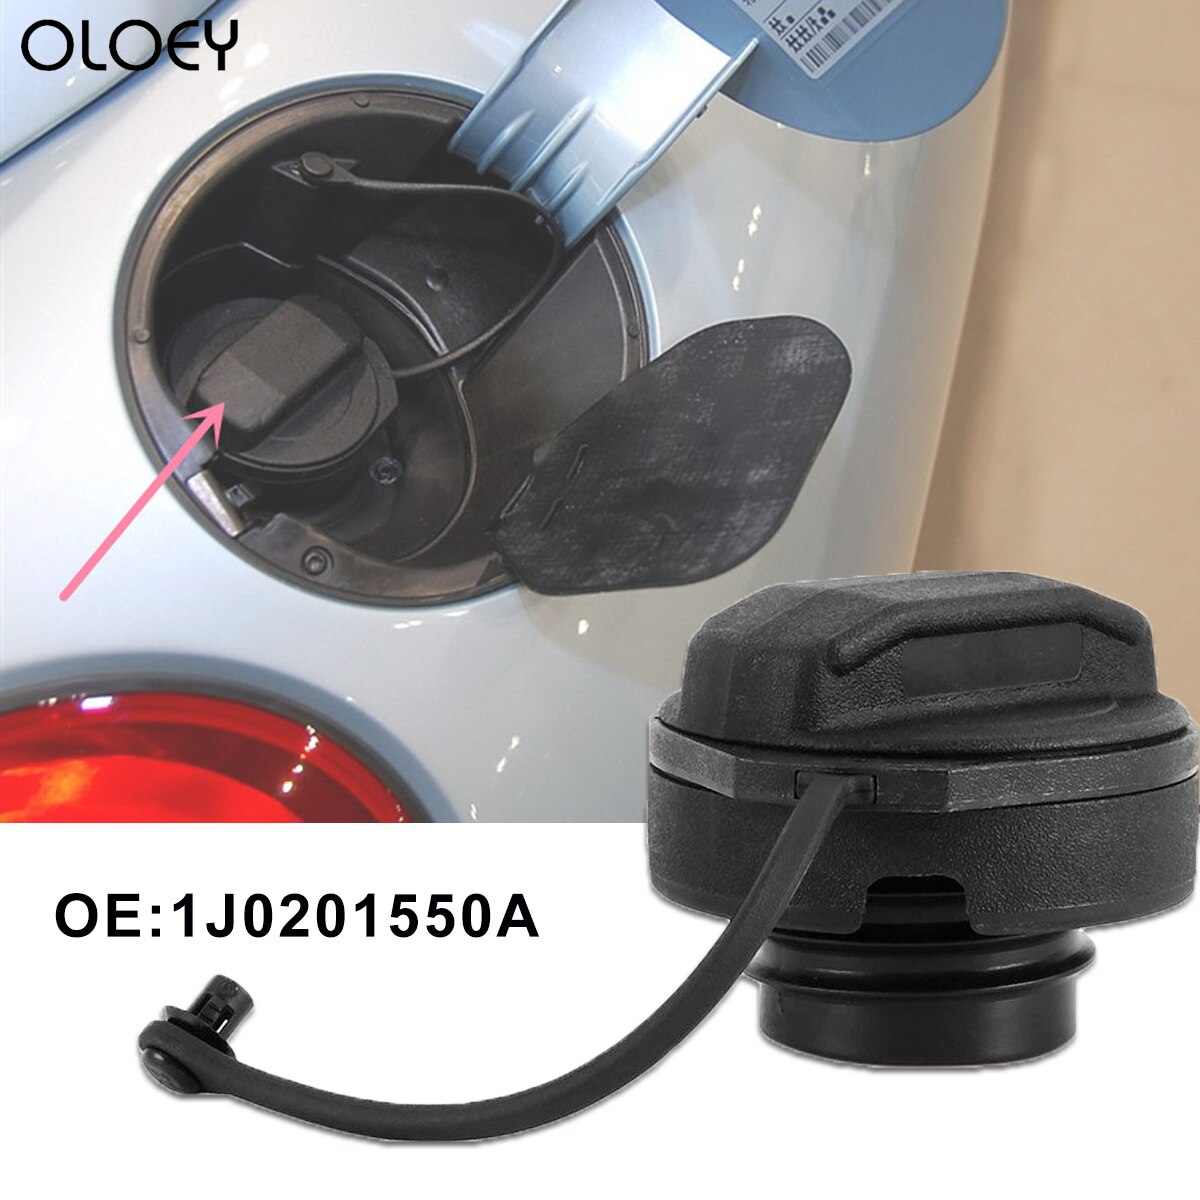 Oloey 1j0201550a tampa do tanque de combustível capa a gasolina diesel para golfe jetta bora polo a2 a4 a6 tampa enchimento do tanque gás frete grátis